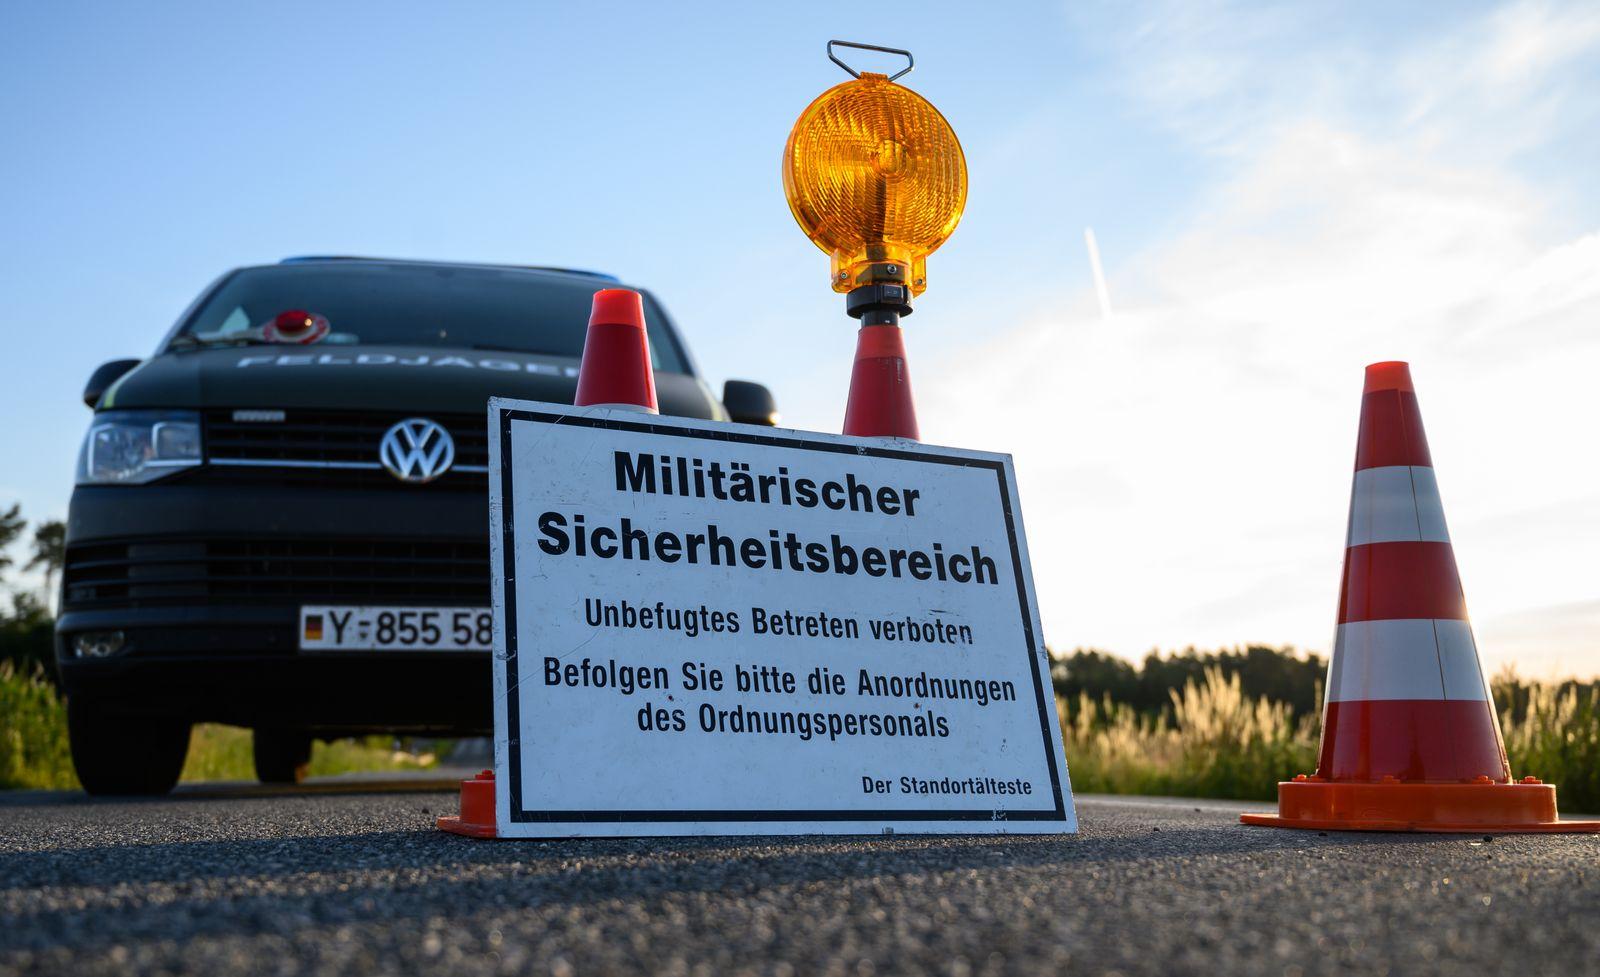 Eurofighter / Mecklenburg-Vorpommern